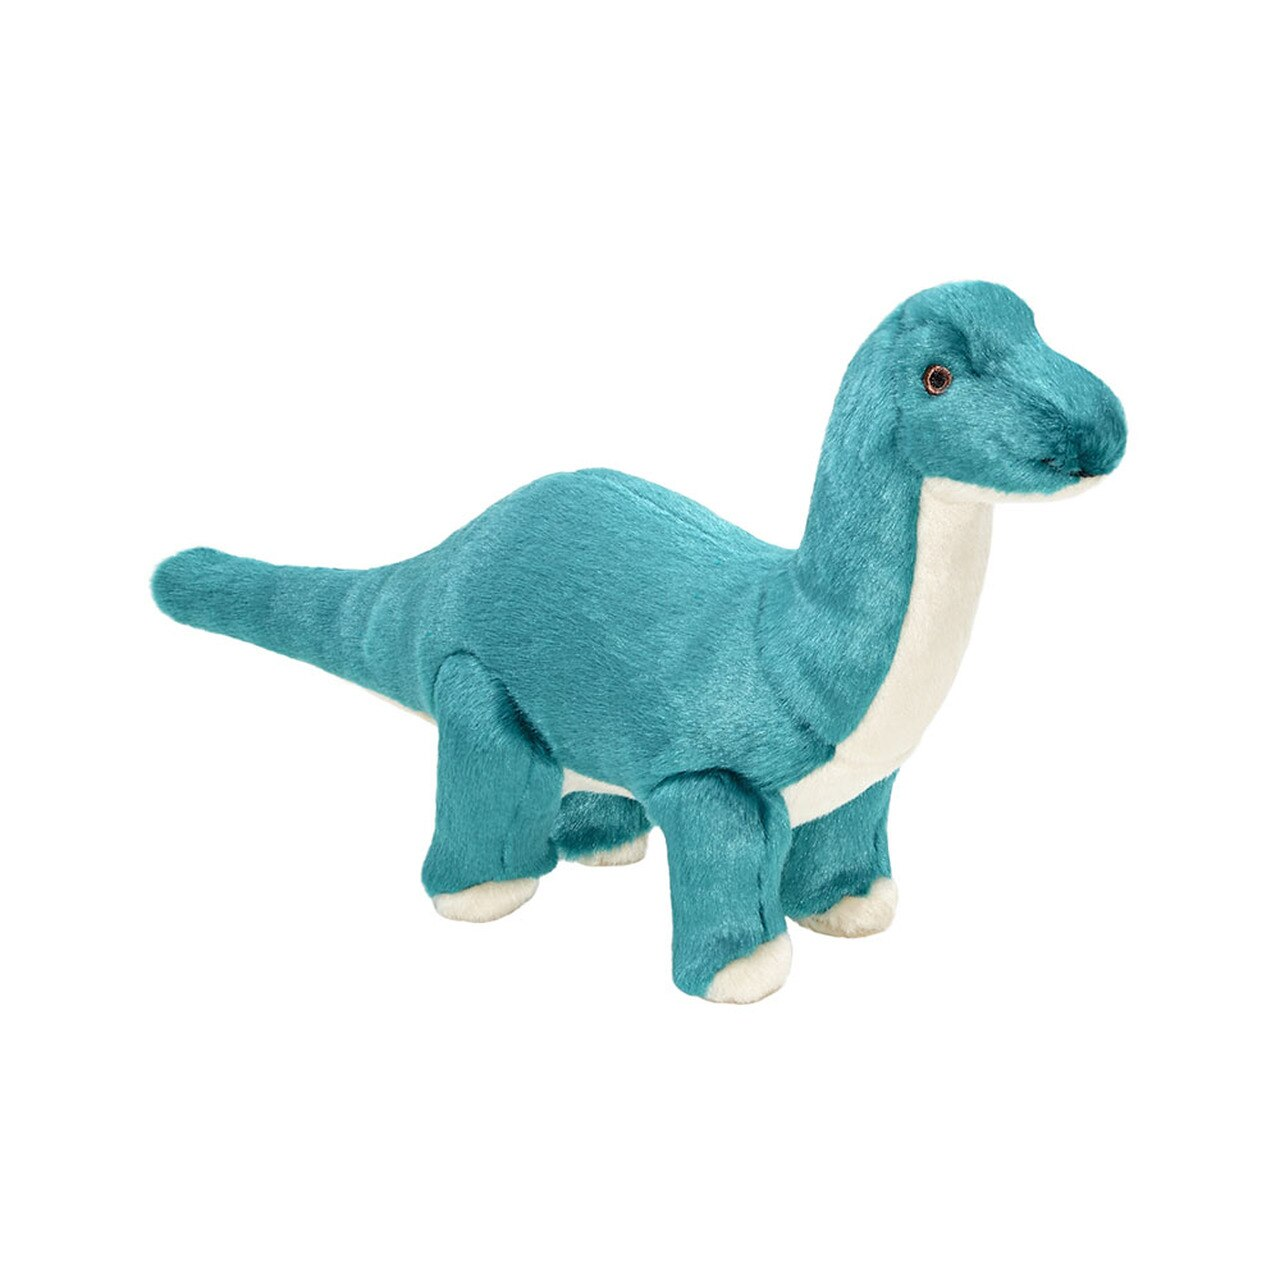 Fluff & Tuff Ross the Brachiosaurus Dog Toy, Medium